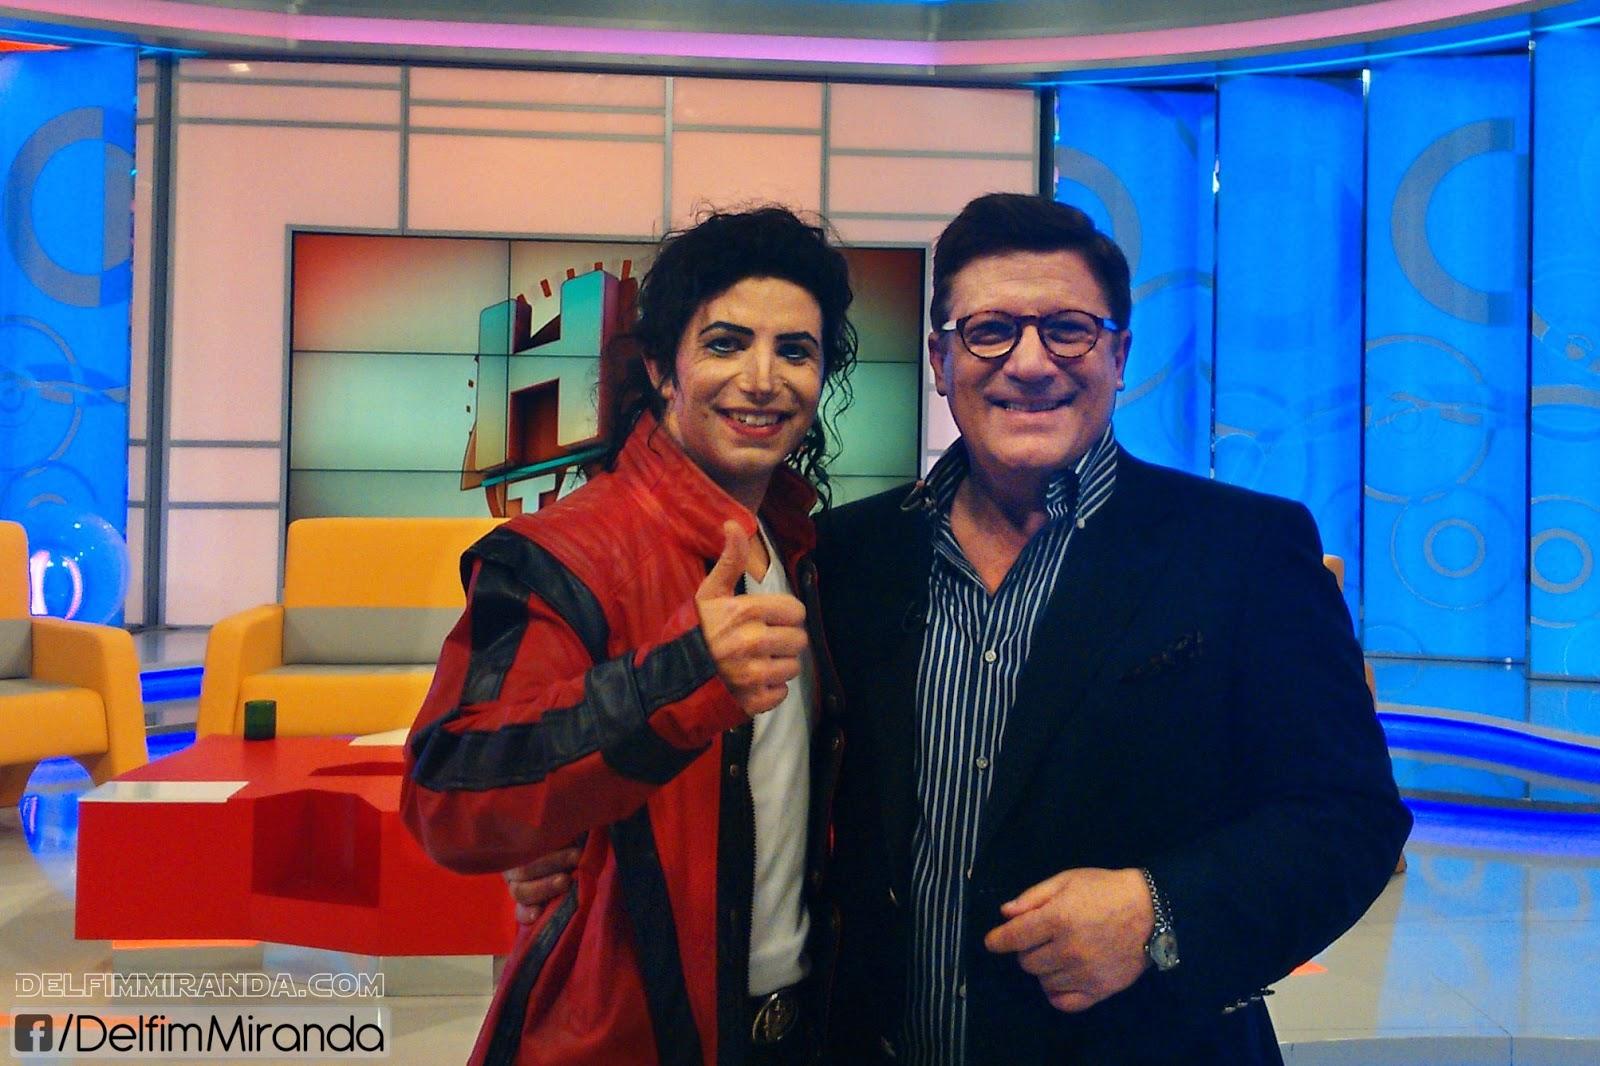 Delfim Miranda - Michael Jackson Tribute - With TV Legend Herman José - Há Tarde - RTP